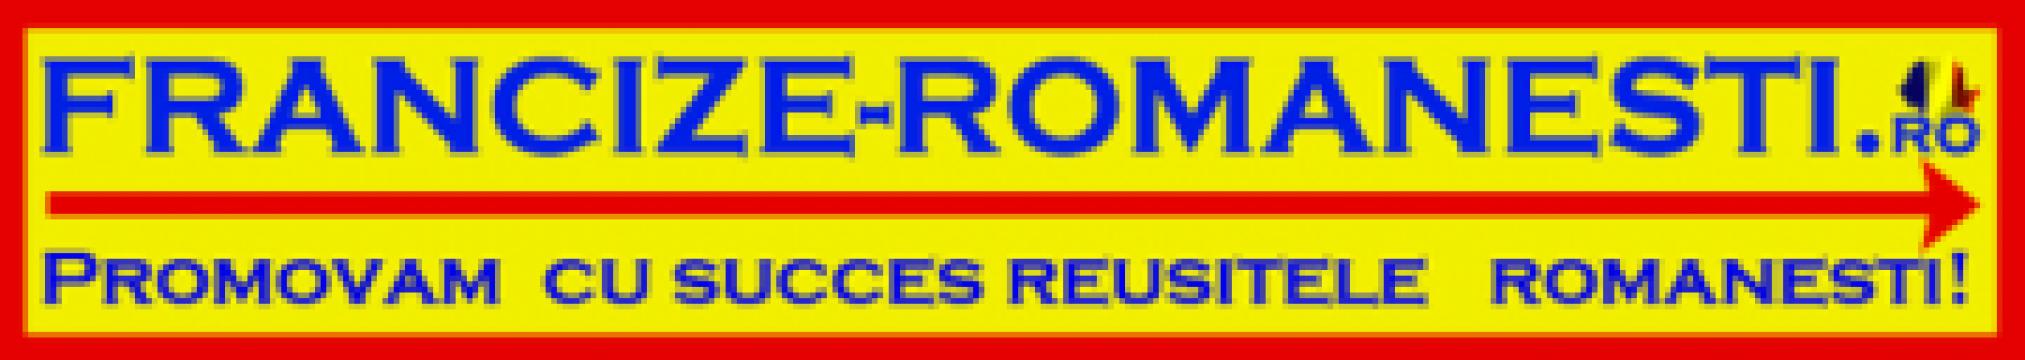 Francize romanesti